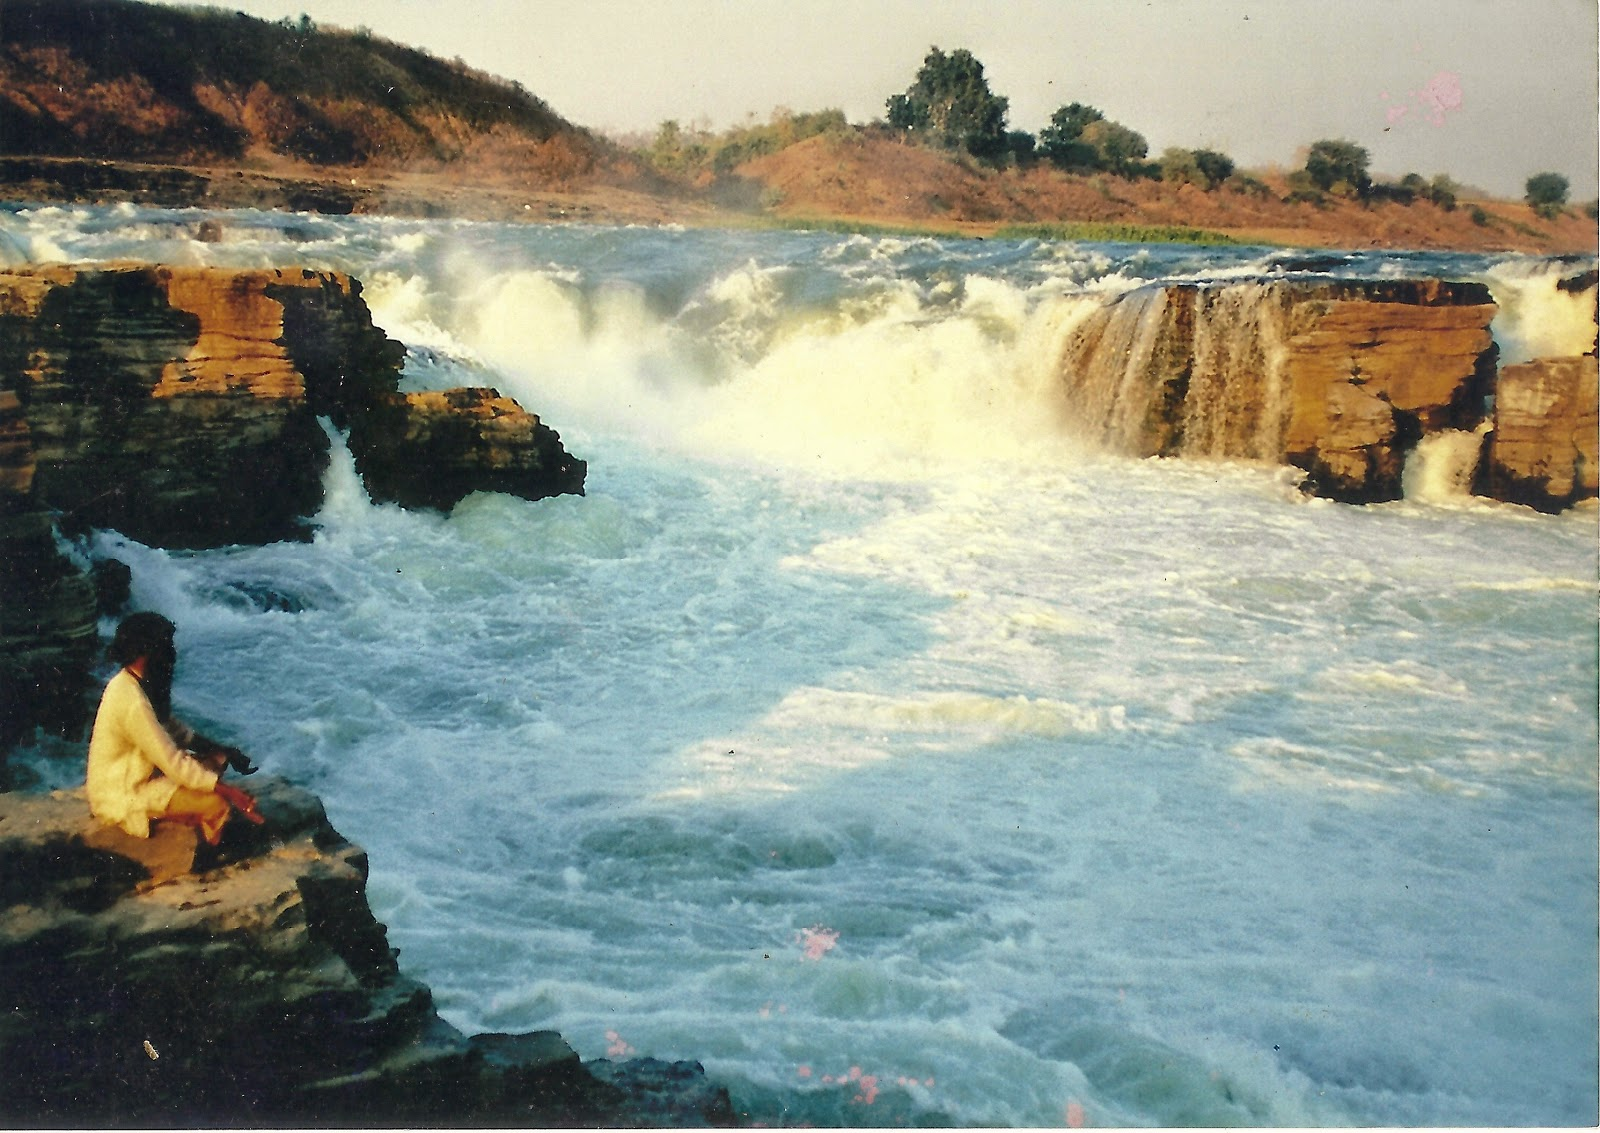 Journey in India: Banalinga, Omkareshwar, Narmada, Narmada ...